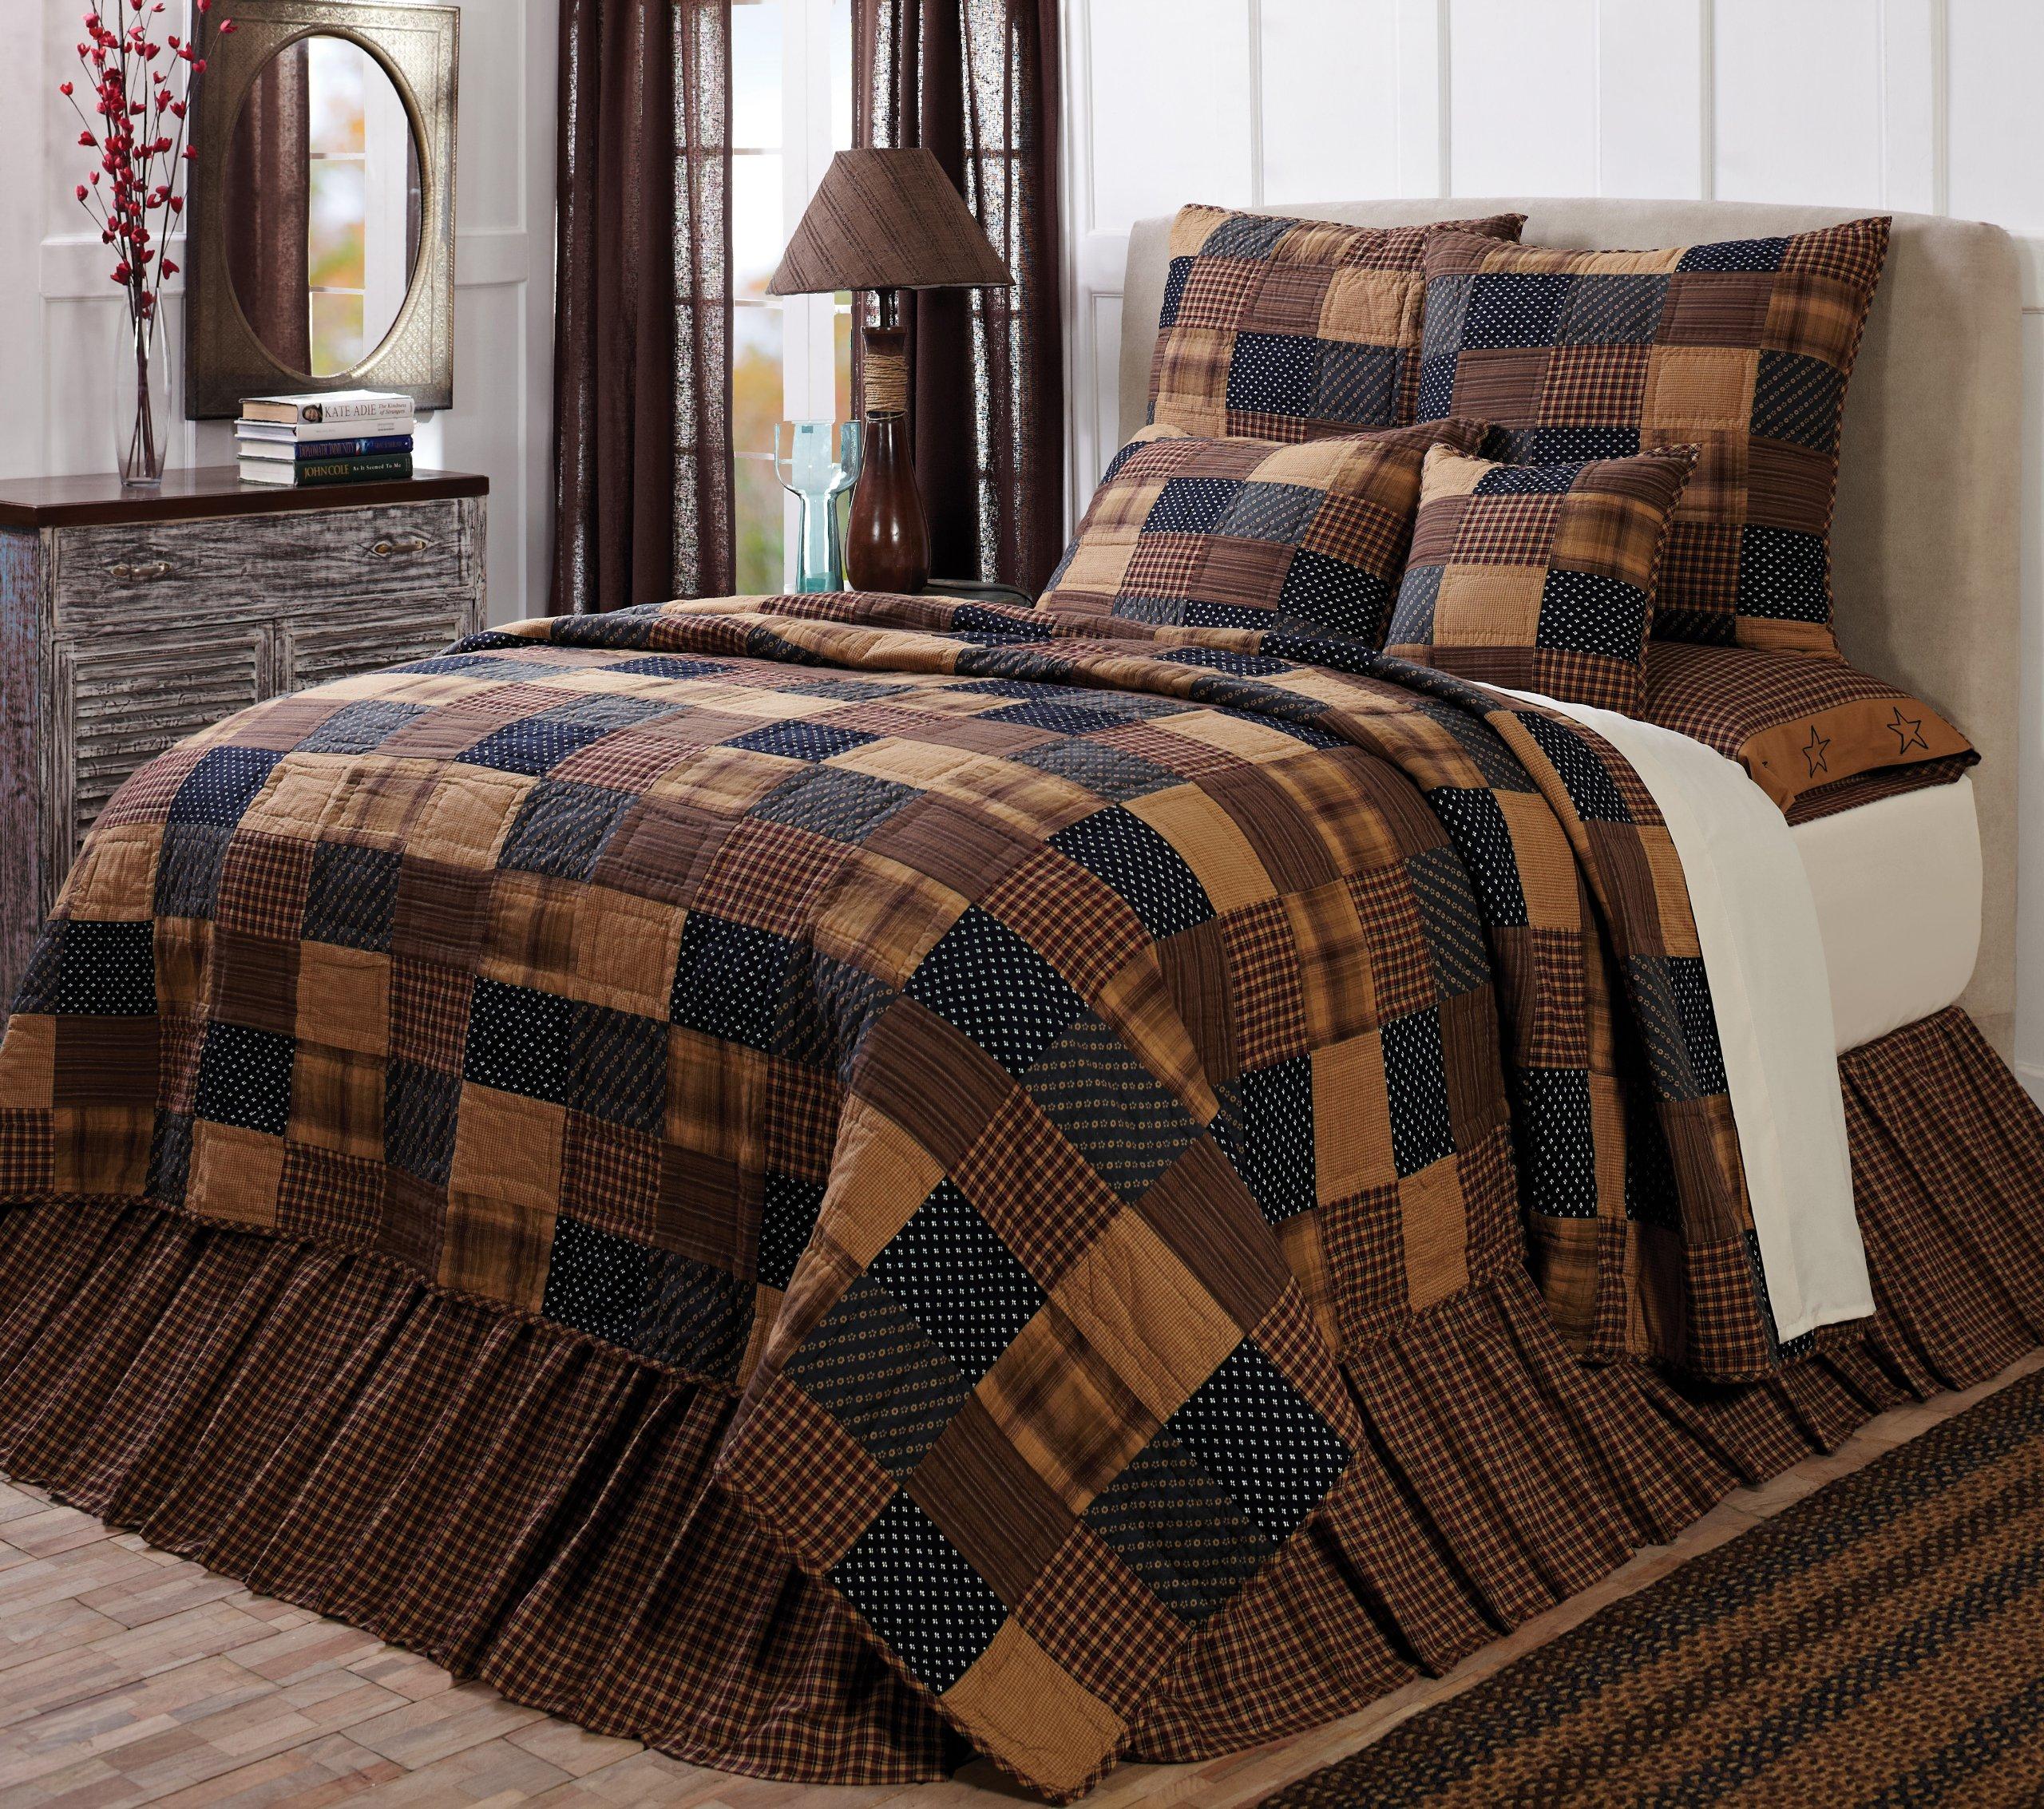 VHC Brands 10427 Patriotic Patch King Quilt 97 x 110